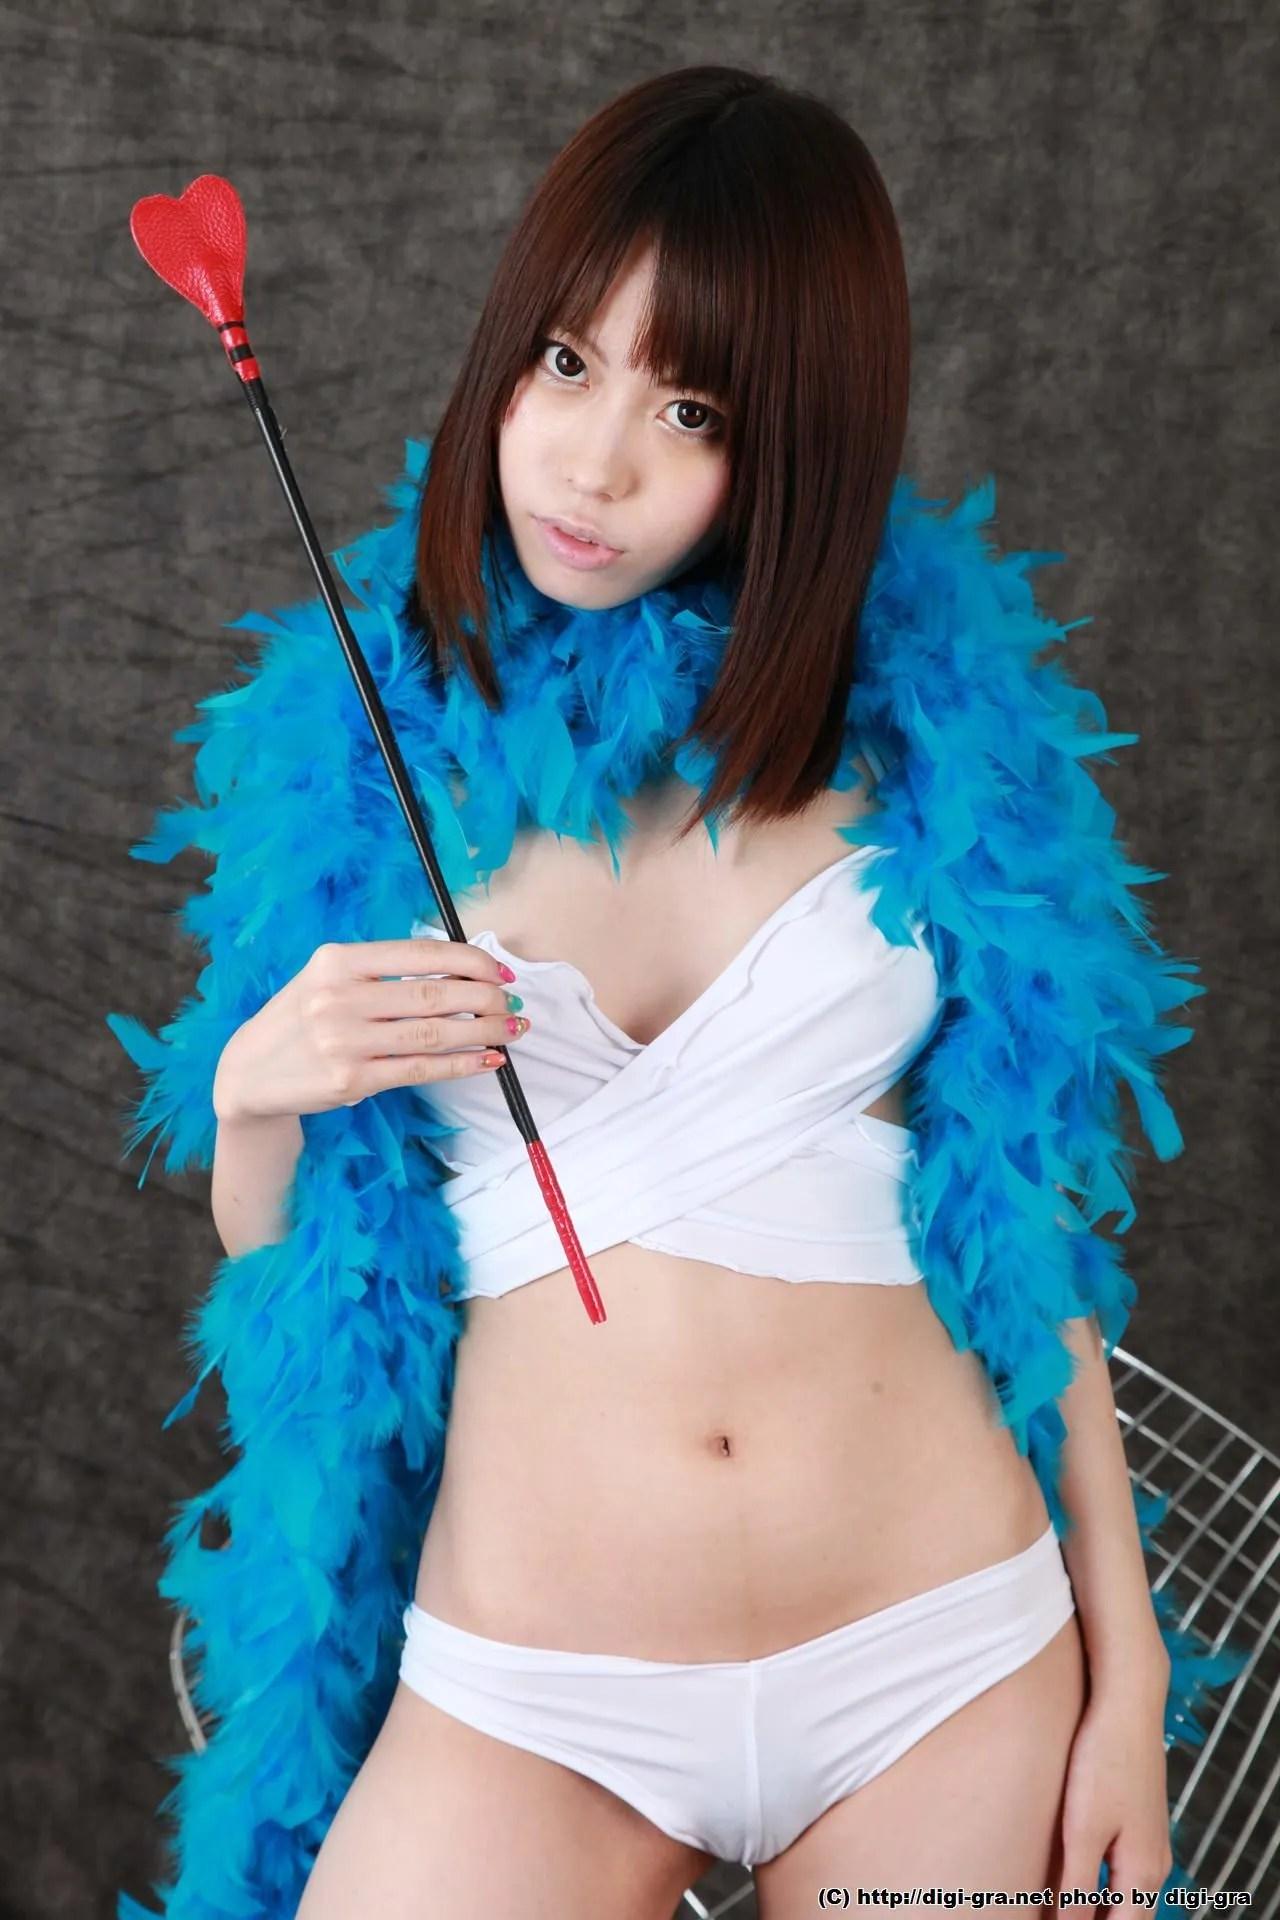 [Digi-Gra] 川菜美铃  Misuzu Kawana Photoset 05 写真集[53P]插图(2)